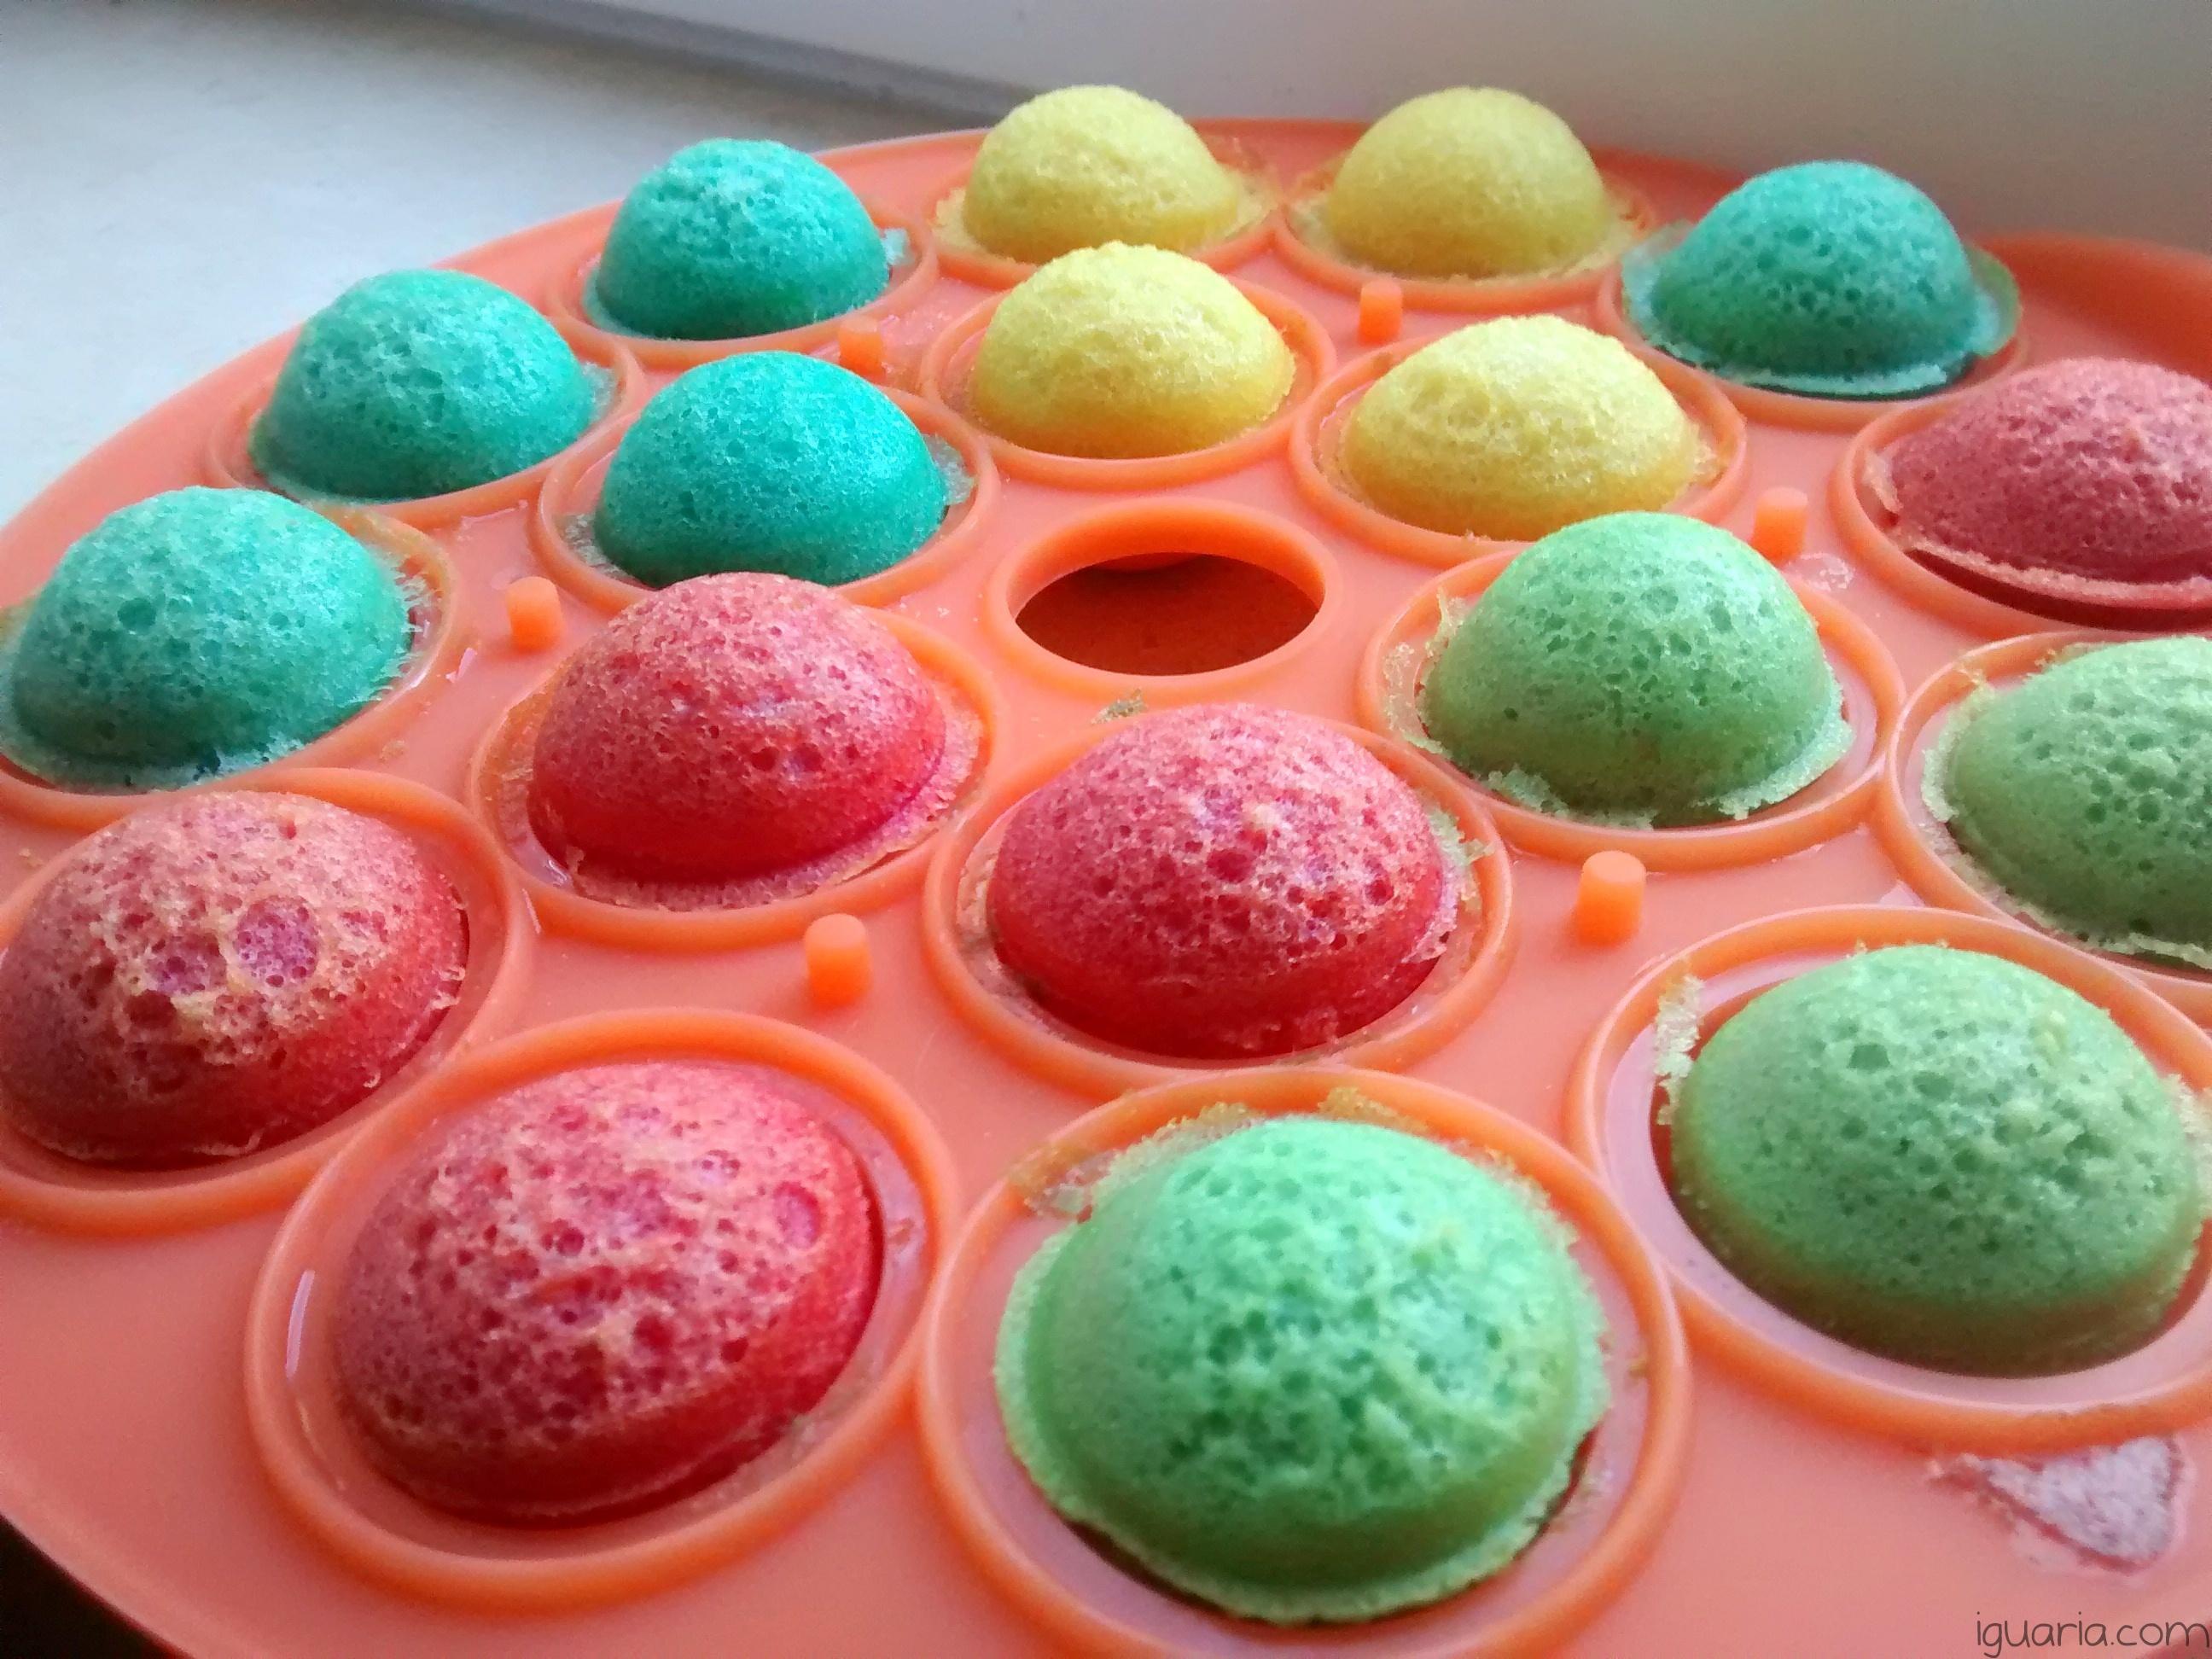 iguaria-bolas-coloridas-no-forma